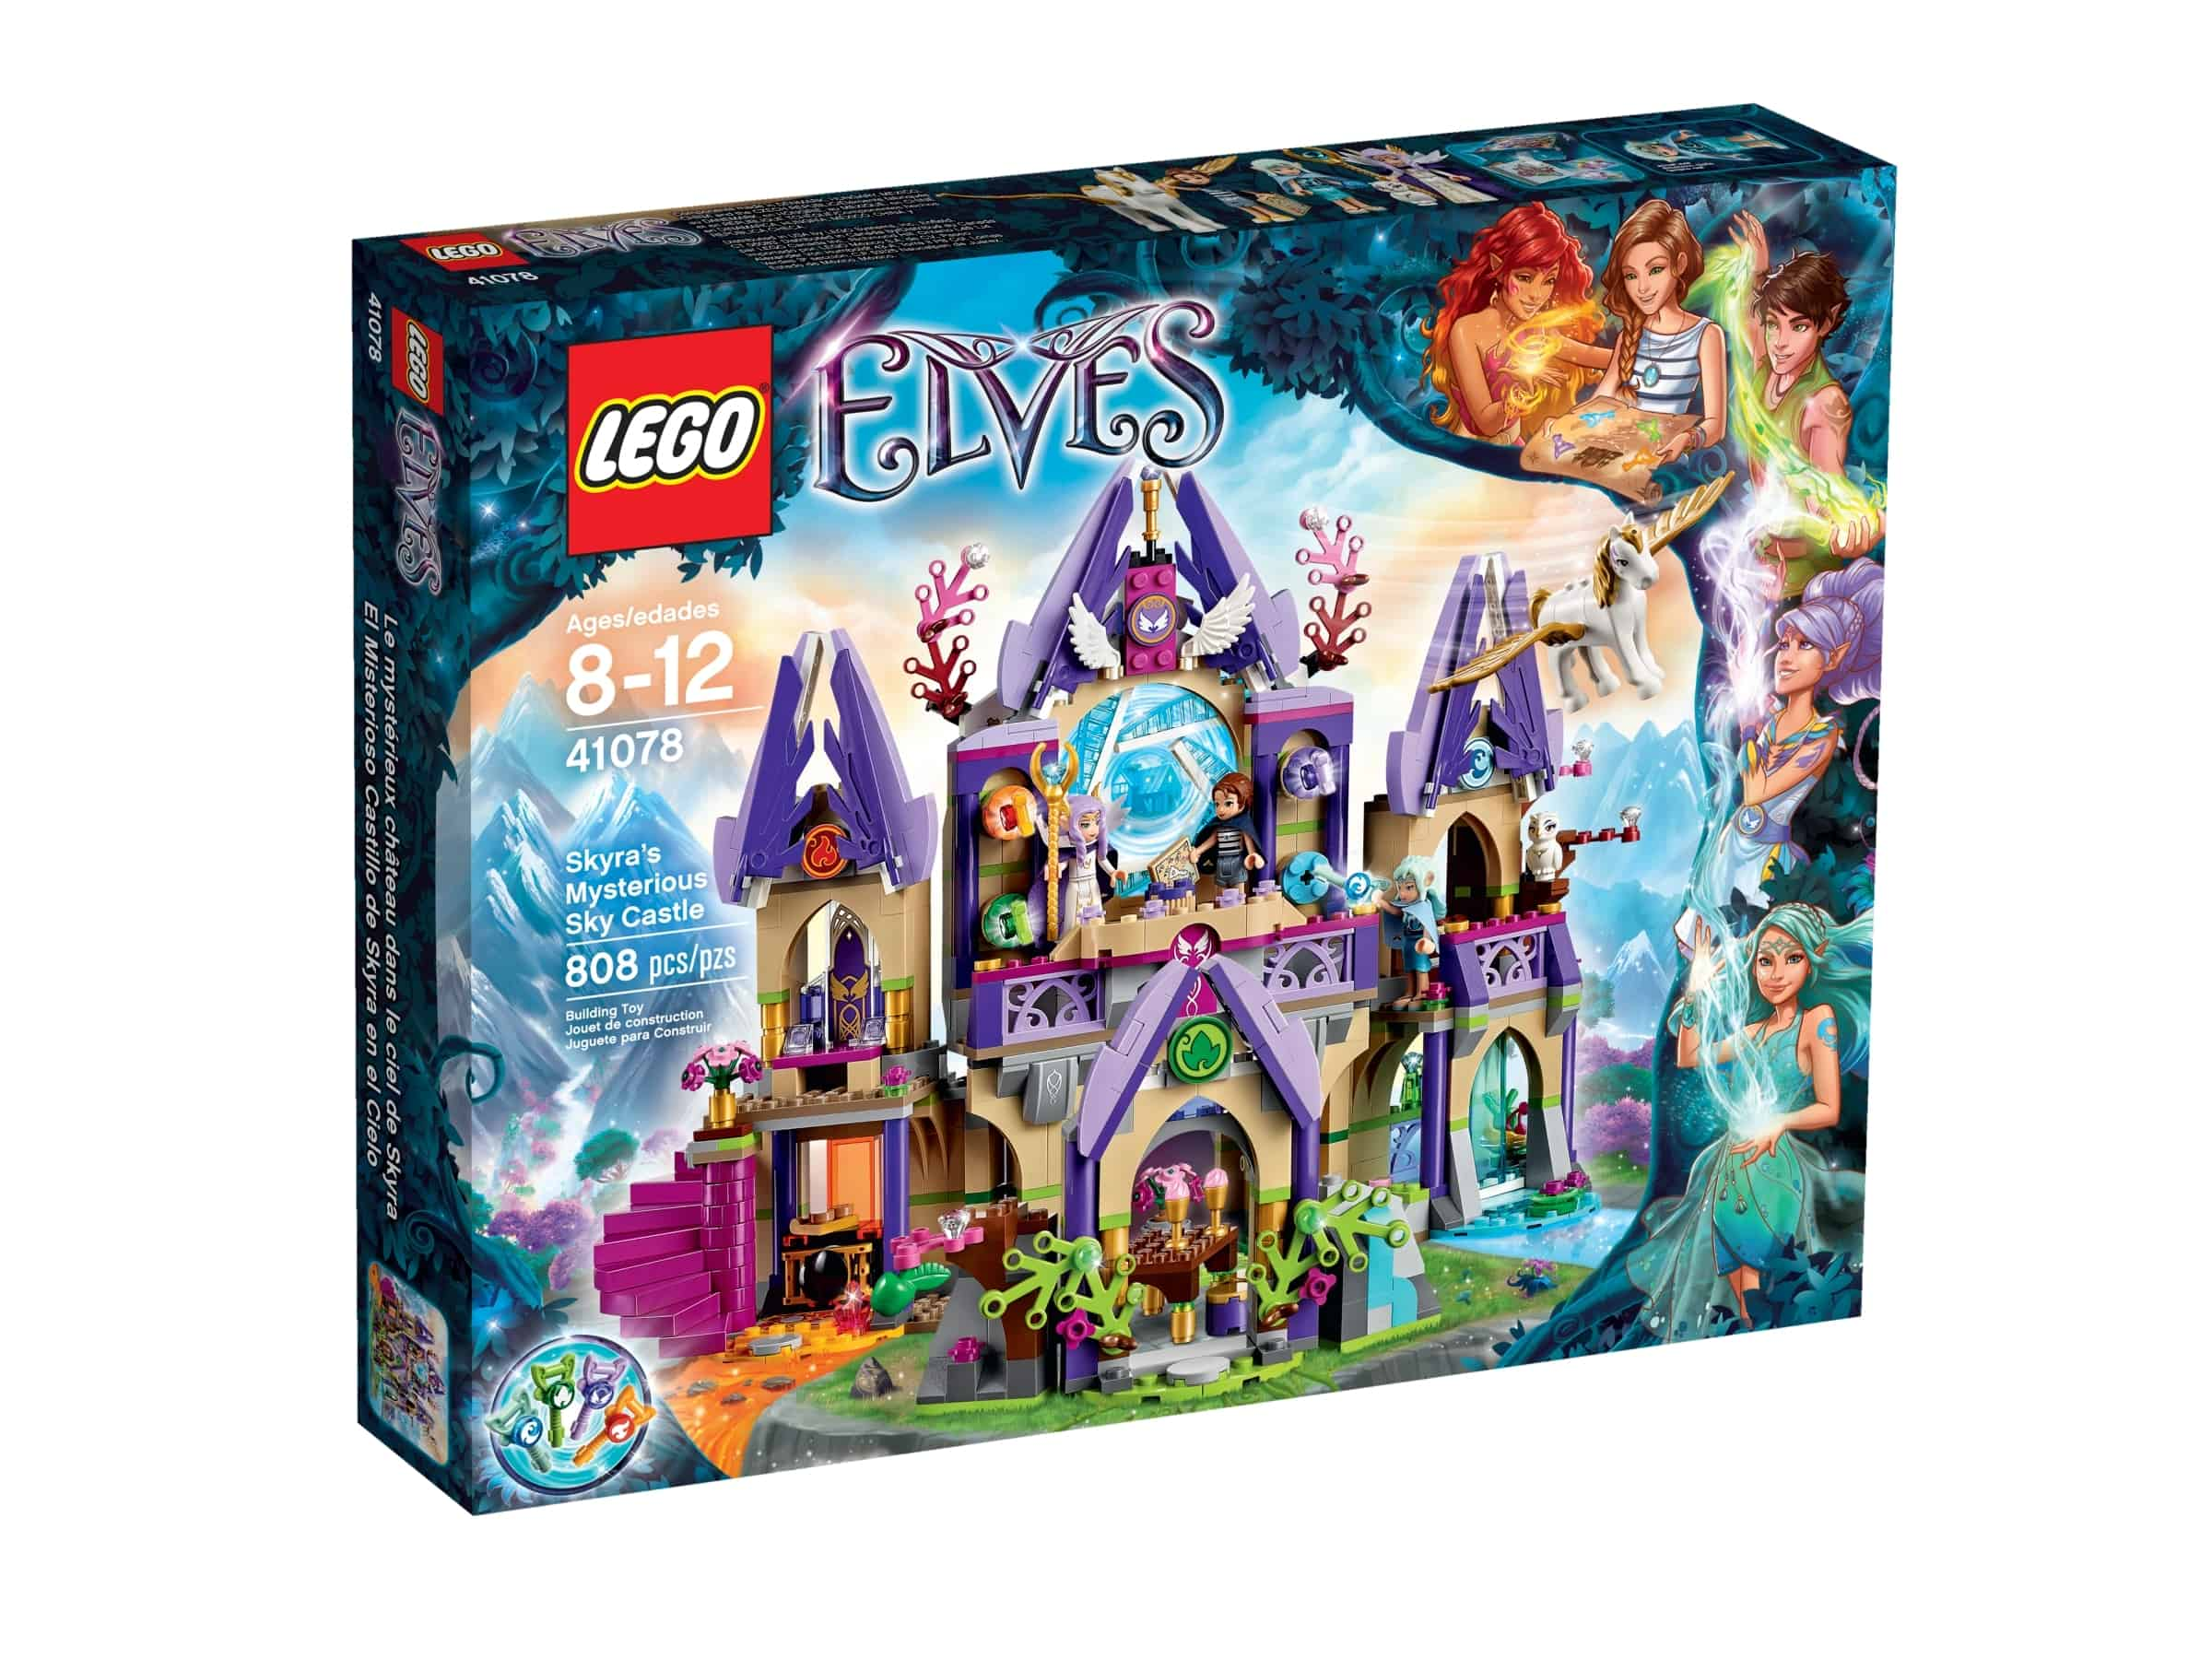 lego 41078 skyras mystiske sky castle